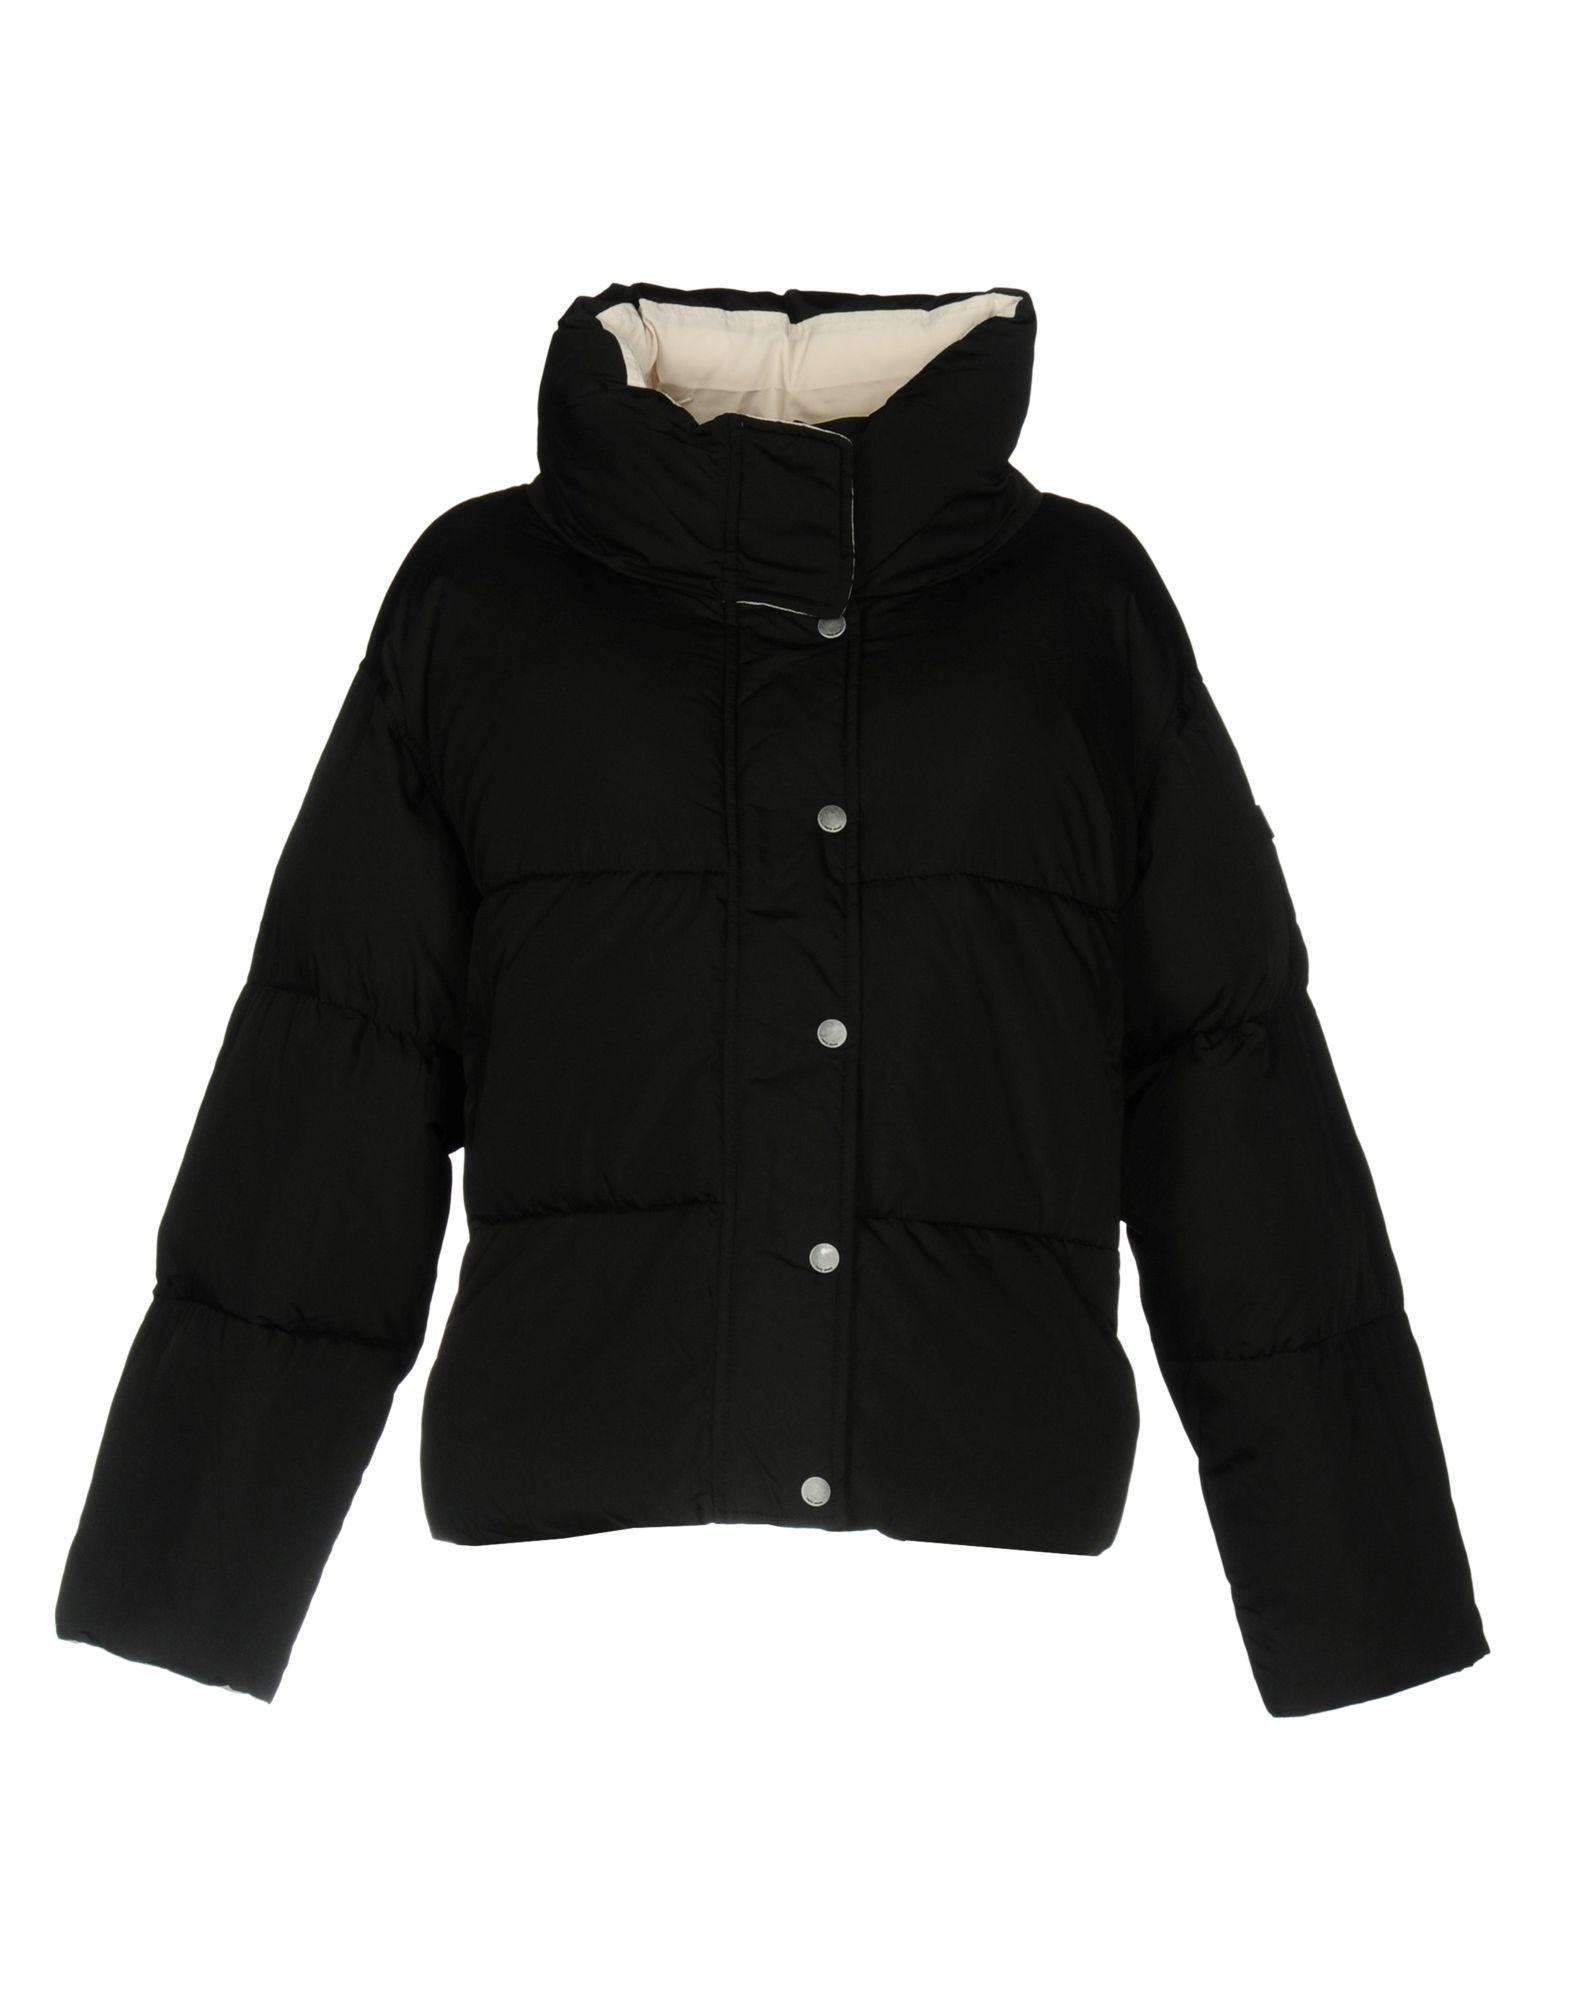 Giubbotto Pepe Jeans Donna - Acquista online su eWlPT